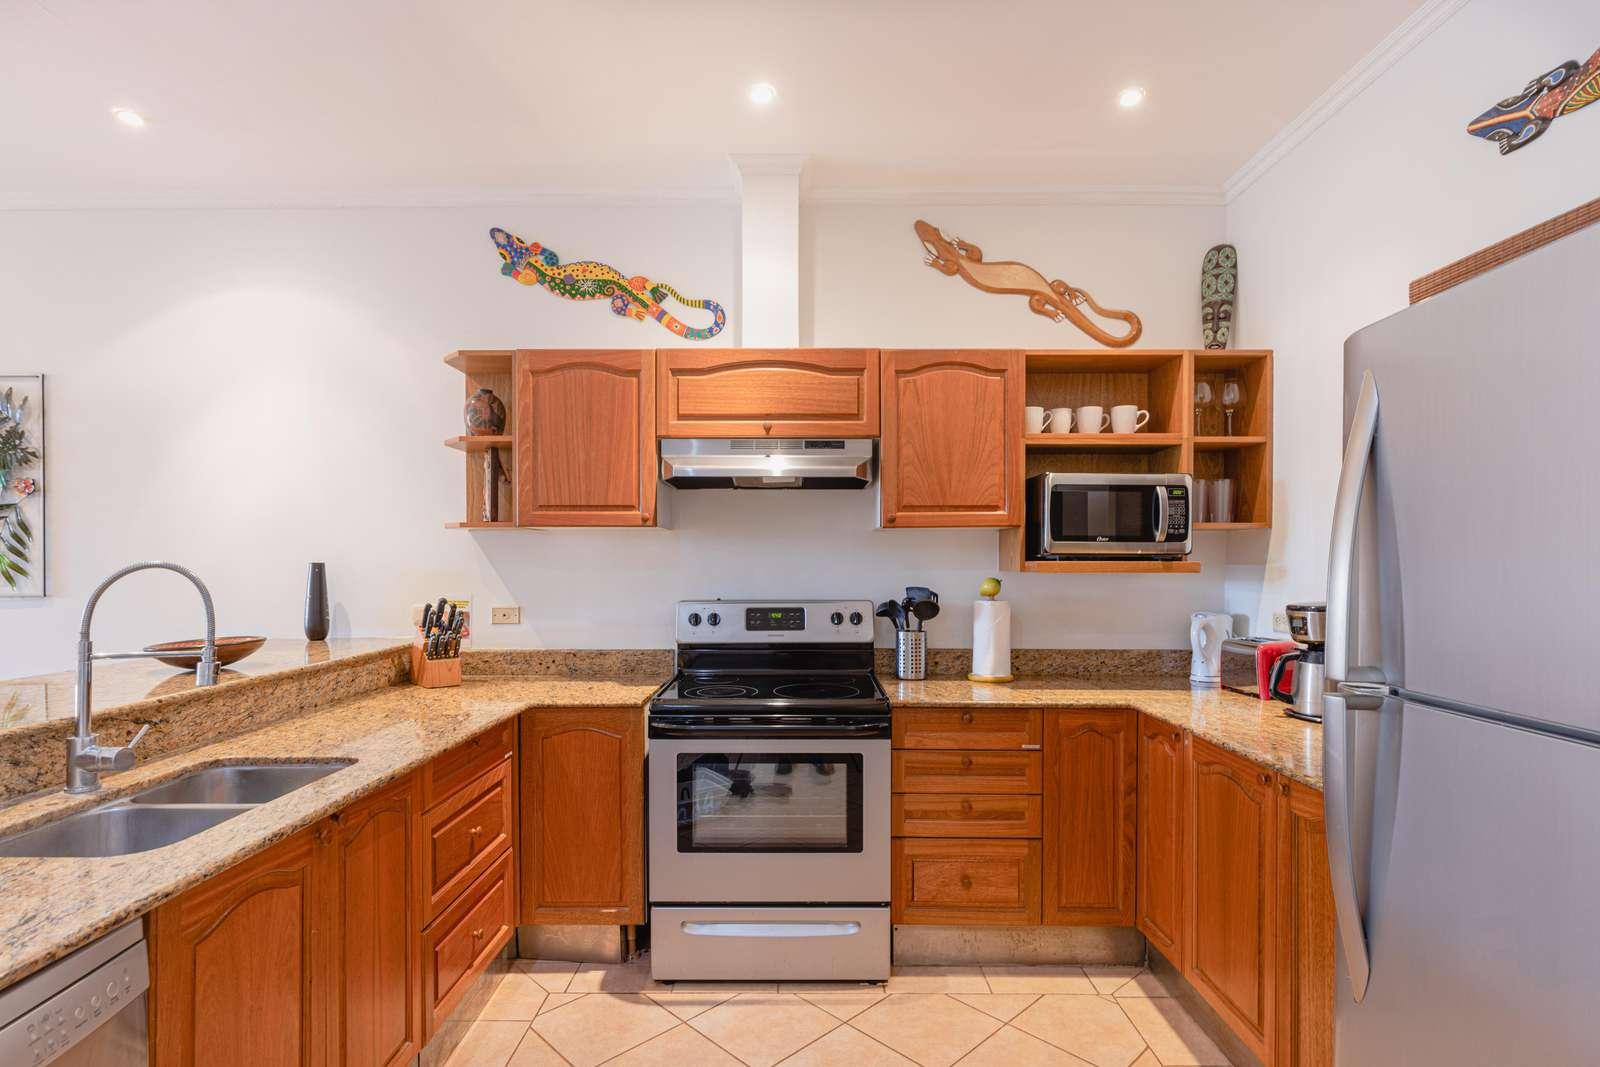 Gourmet kitchen, stainless steel appliances, granite countertops